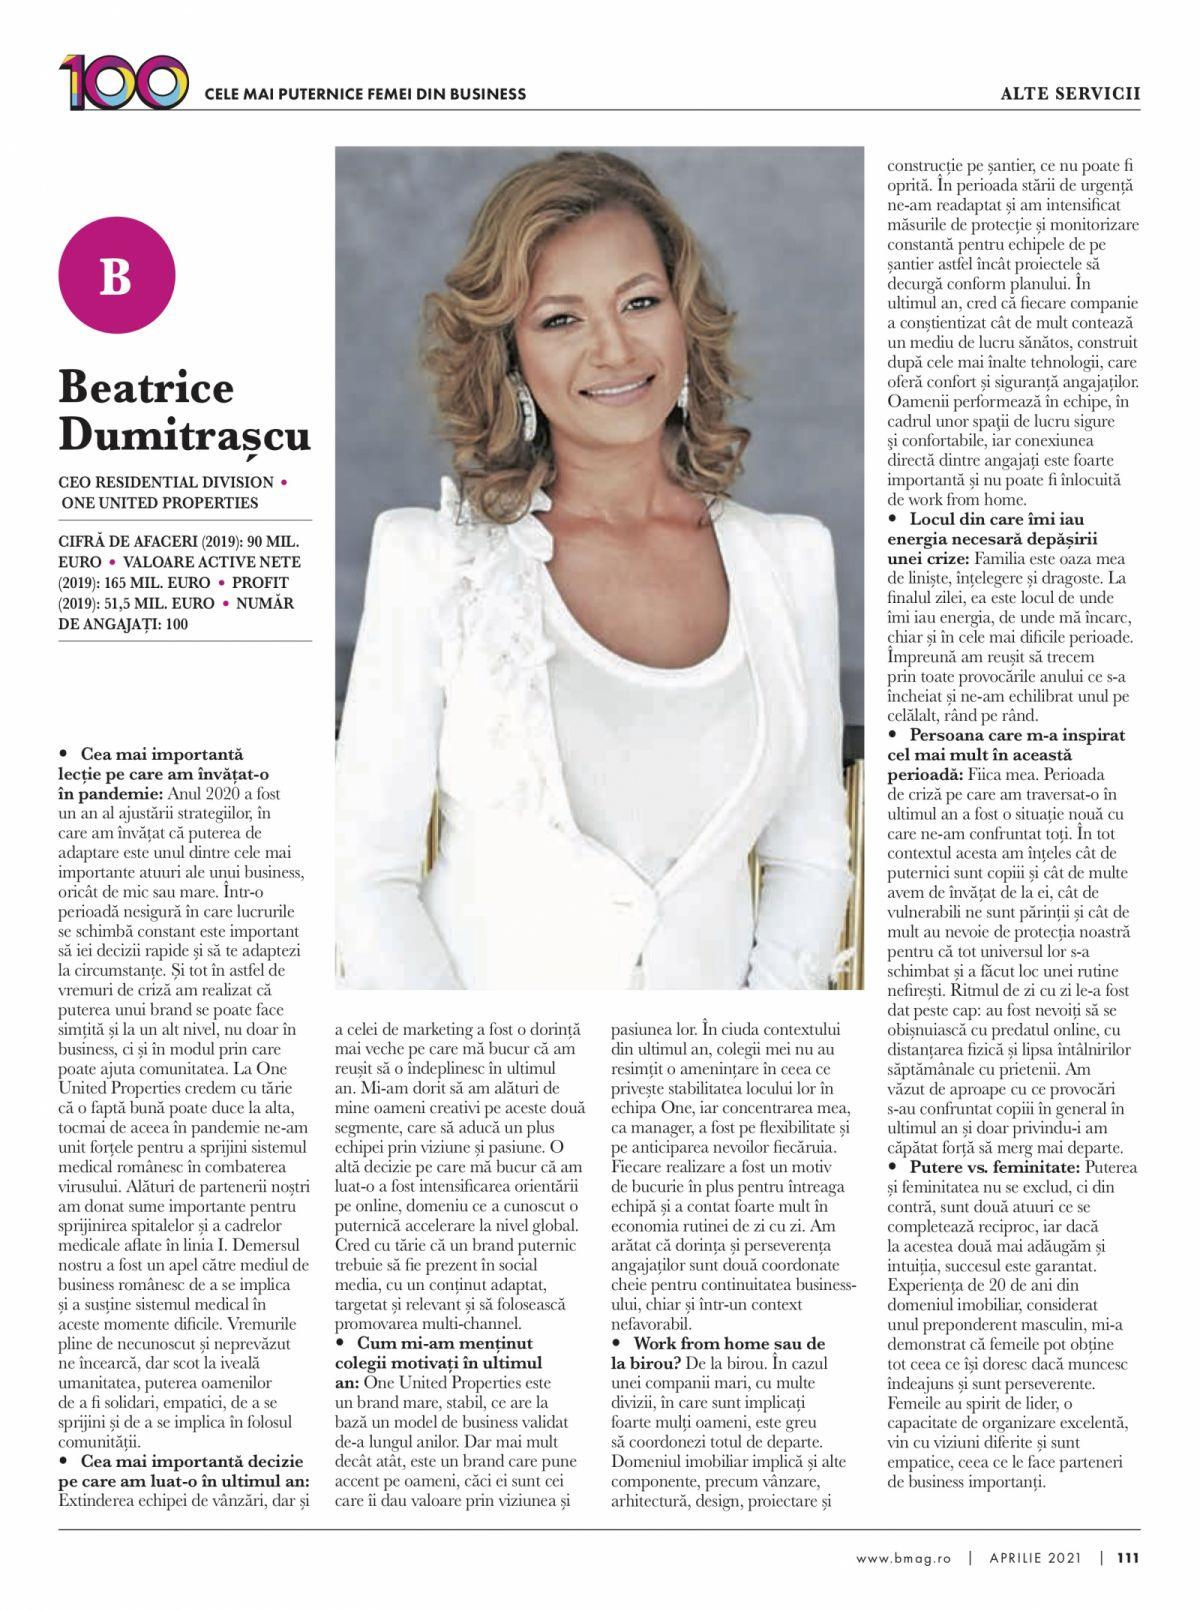 beatrice_dumitrascu_page_111.jpg